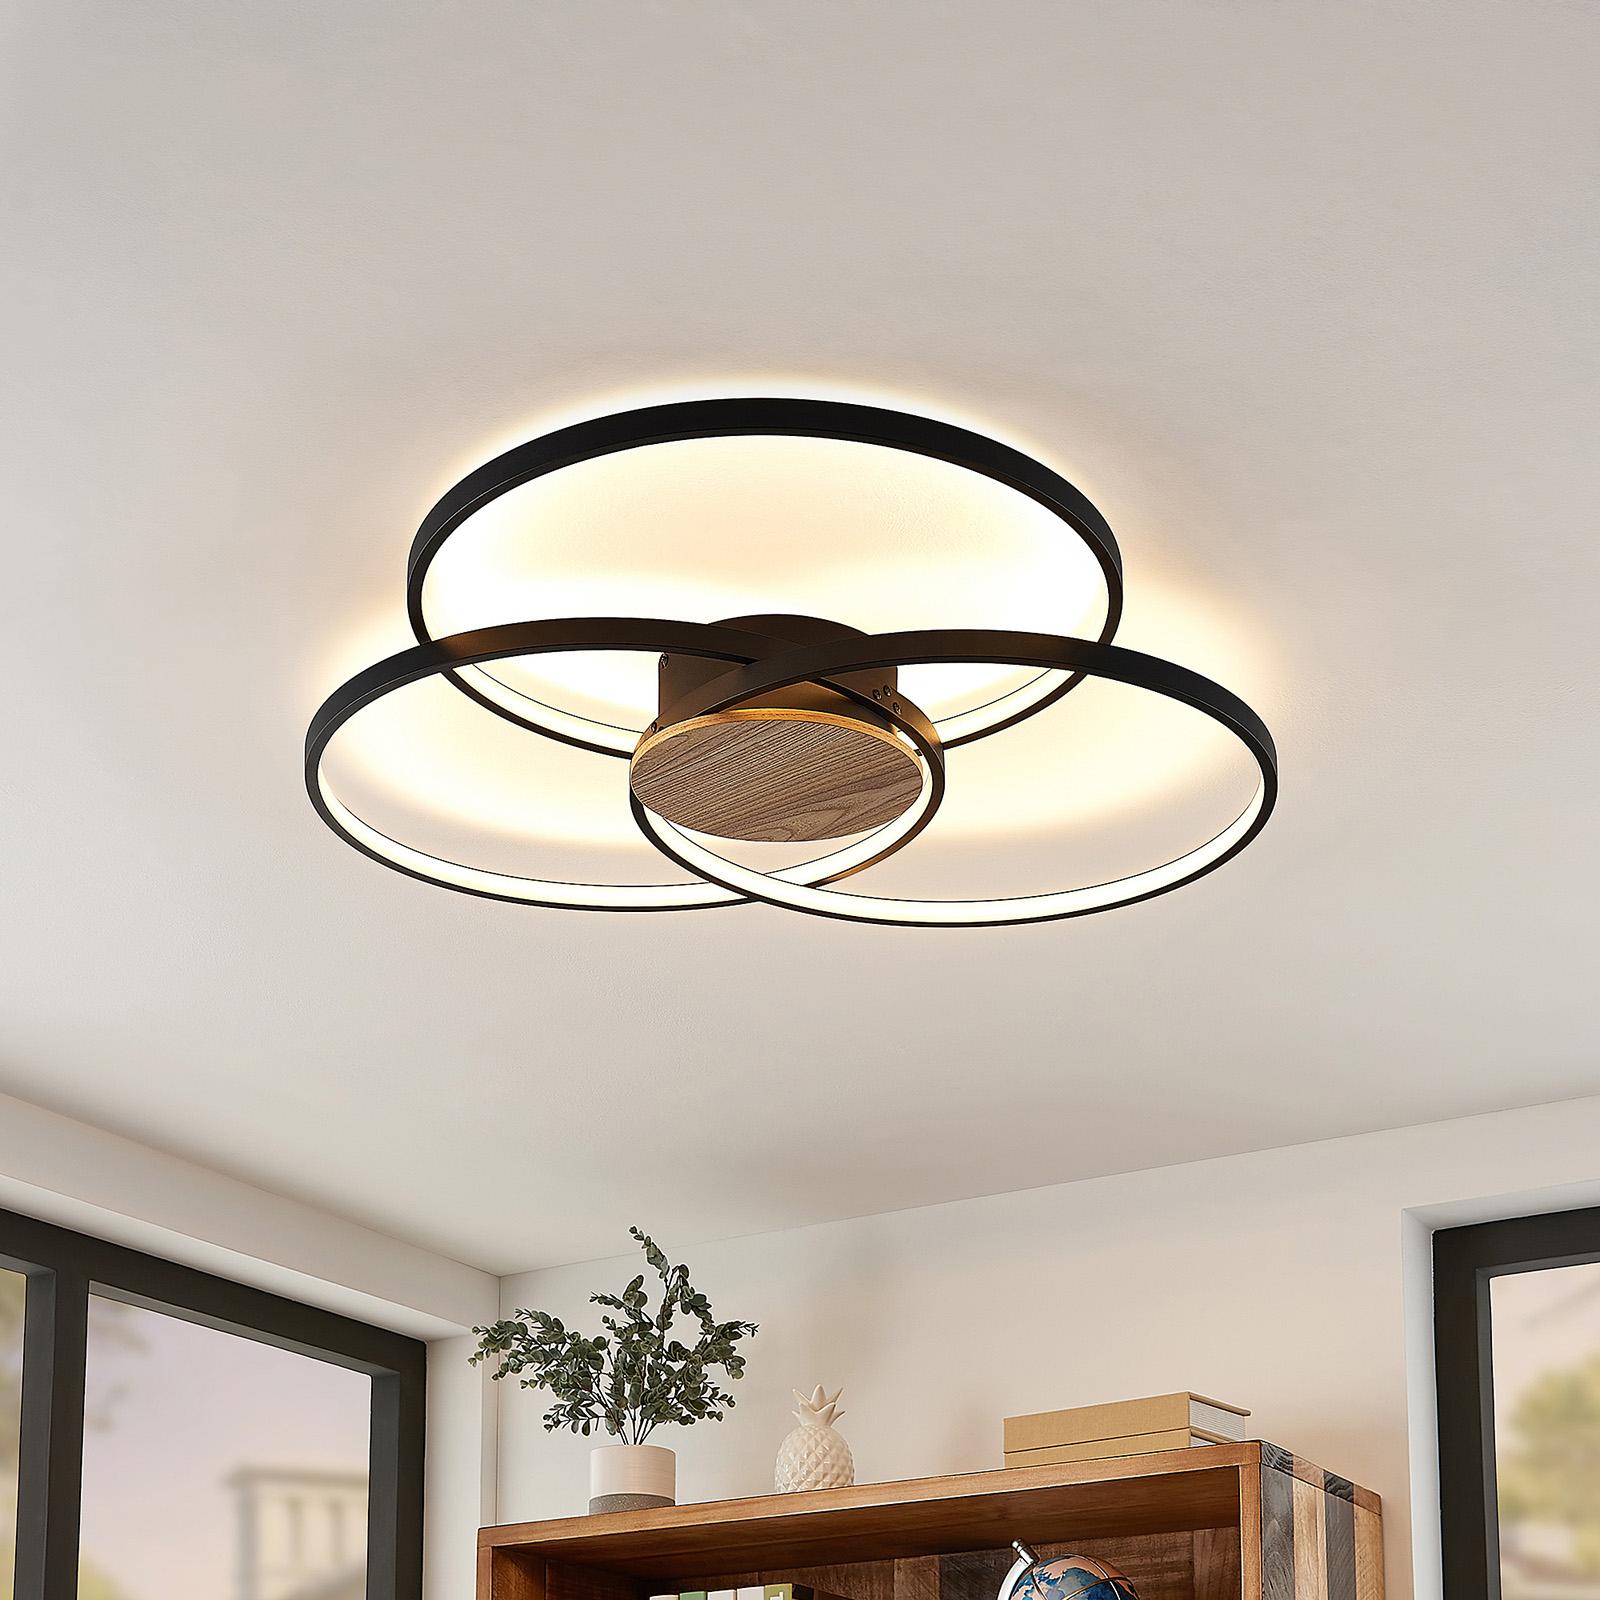 Lindby Riley LED-Deckenleuchte, dimmbar, schwarz